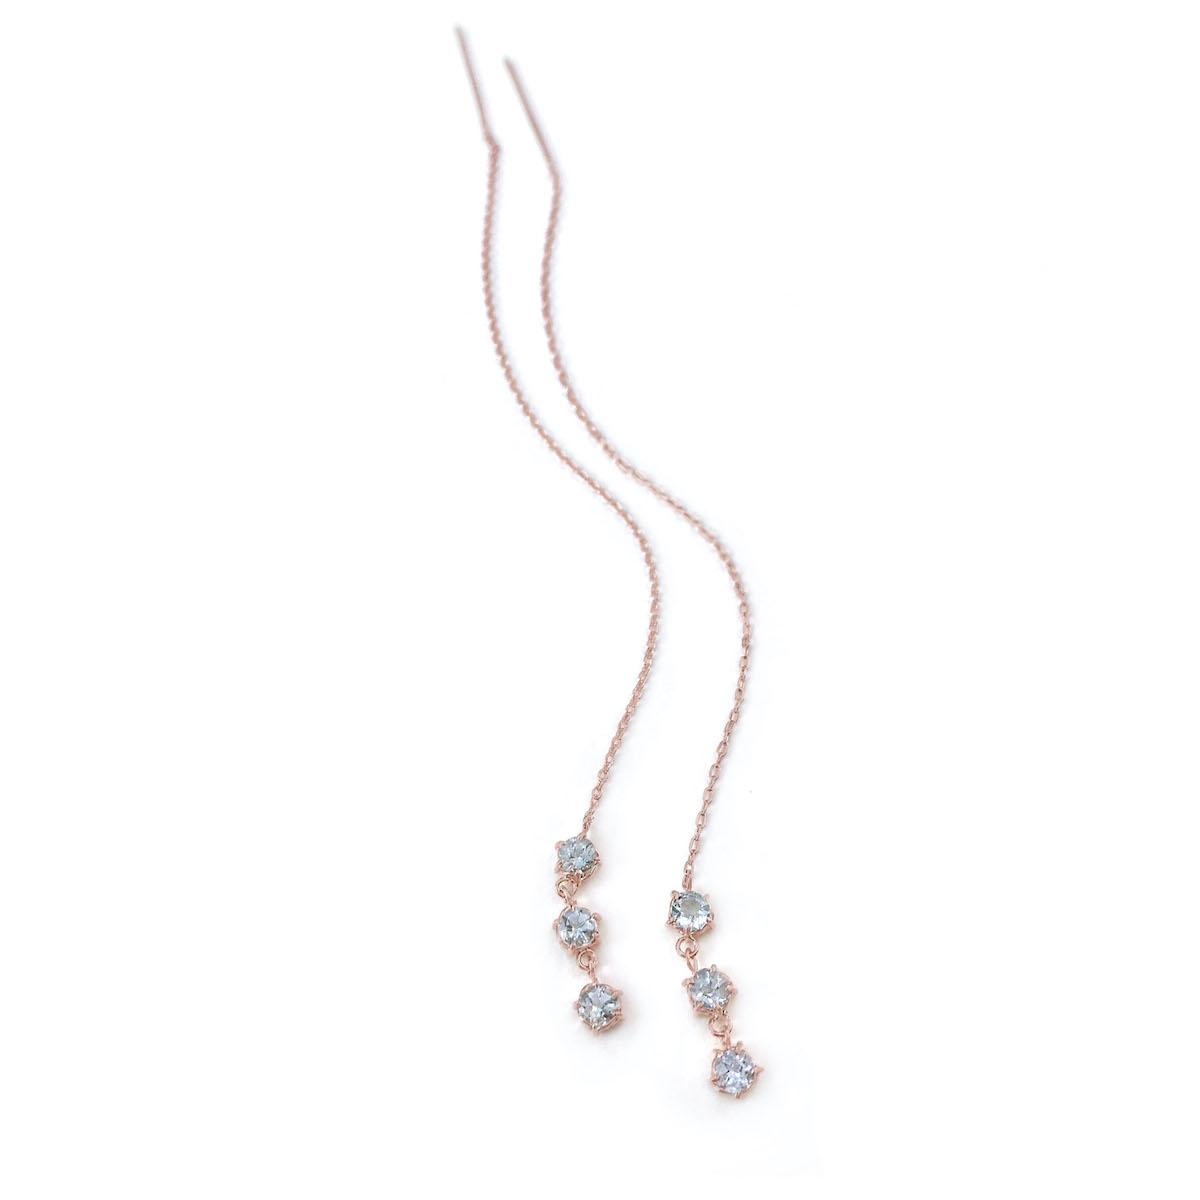 twist-prong-set-aquamarine-three-stone-threaders-dangle-earrings-18k-14k-jewelyrie_5466